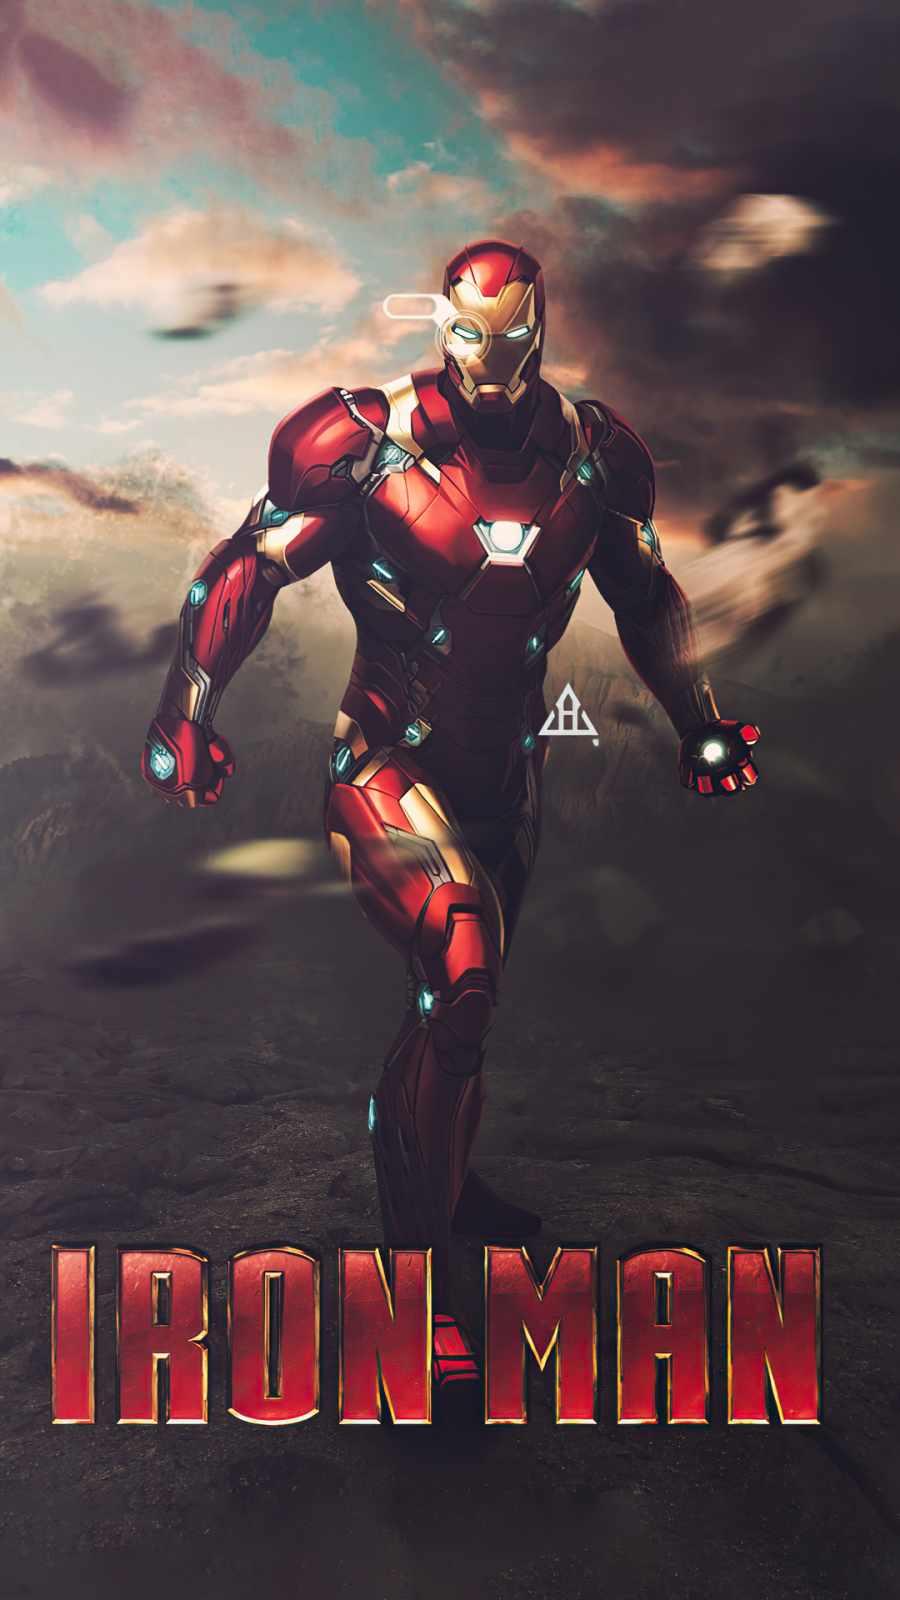 The Iron Man Poster